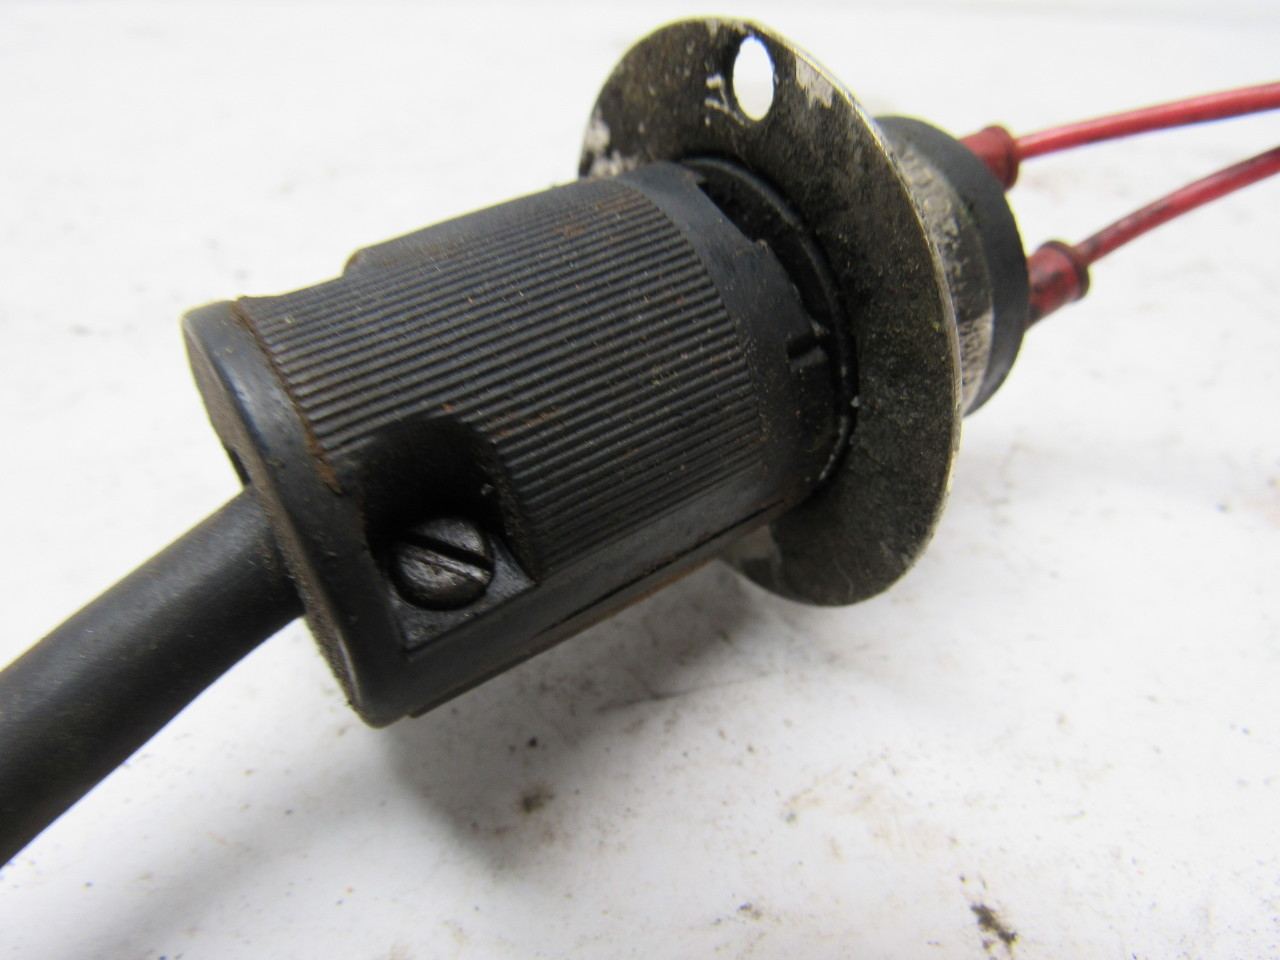 Stuff midget electrical two prong plug like